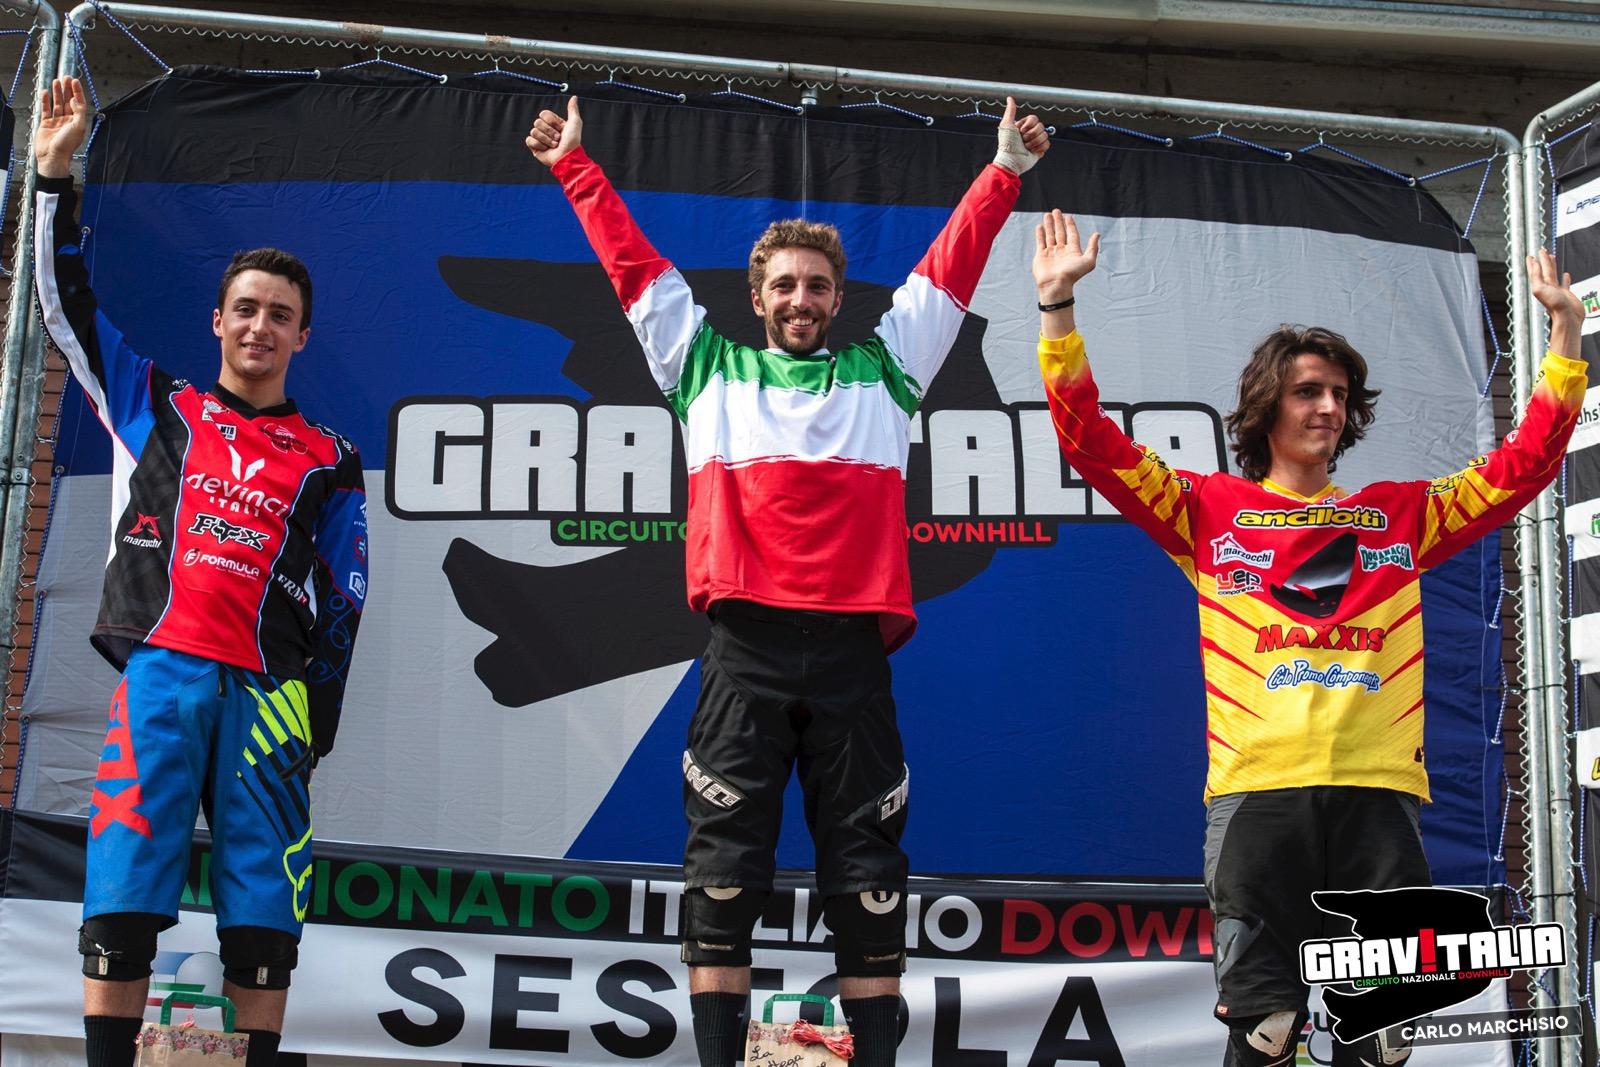 PhotoCarloMarchisio_GIT2015_CampionatiItaliani_Sestola_109